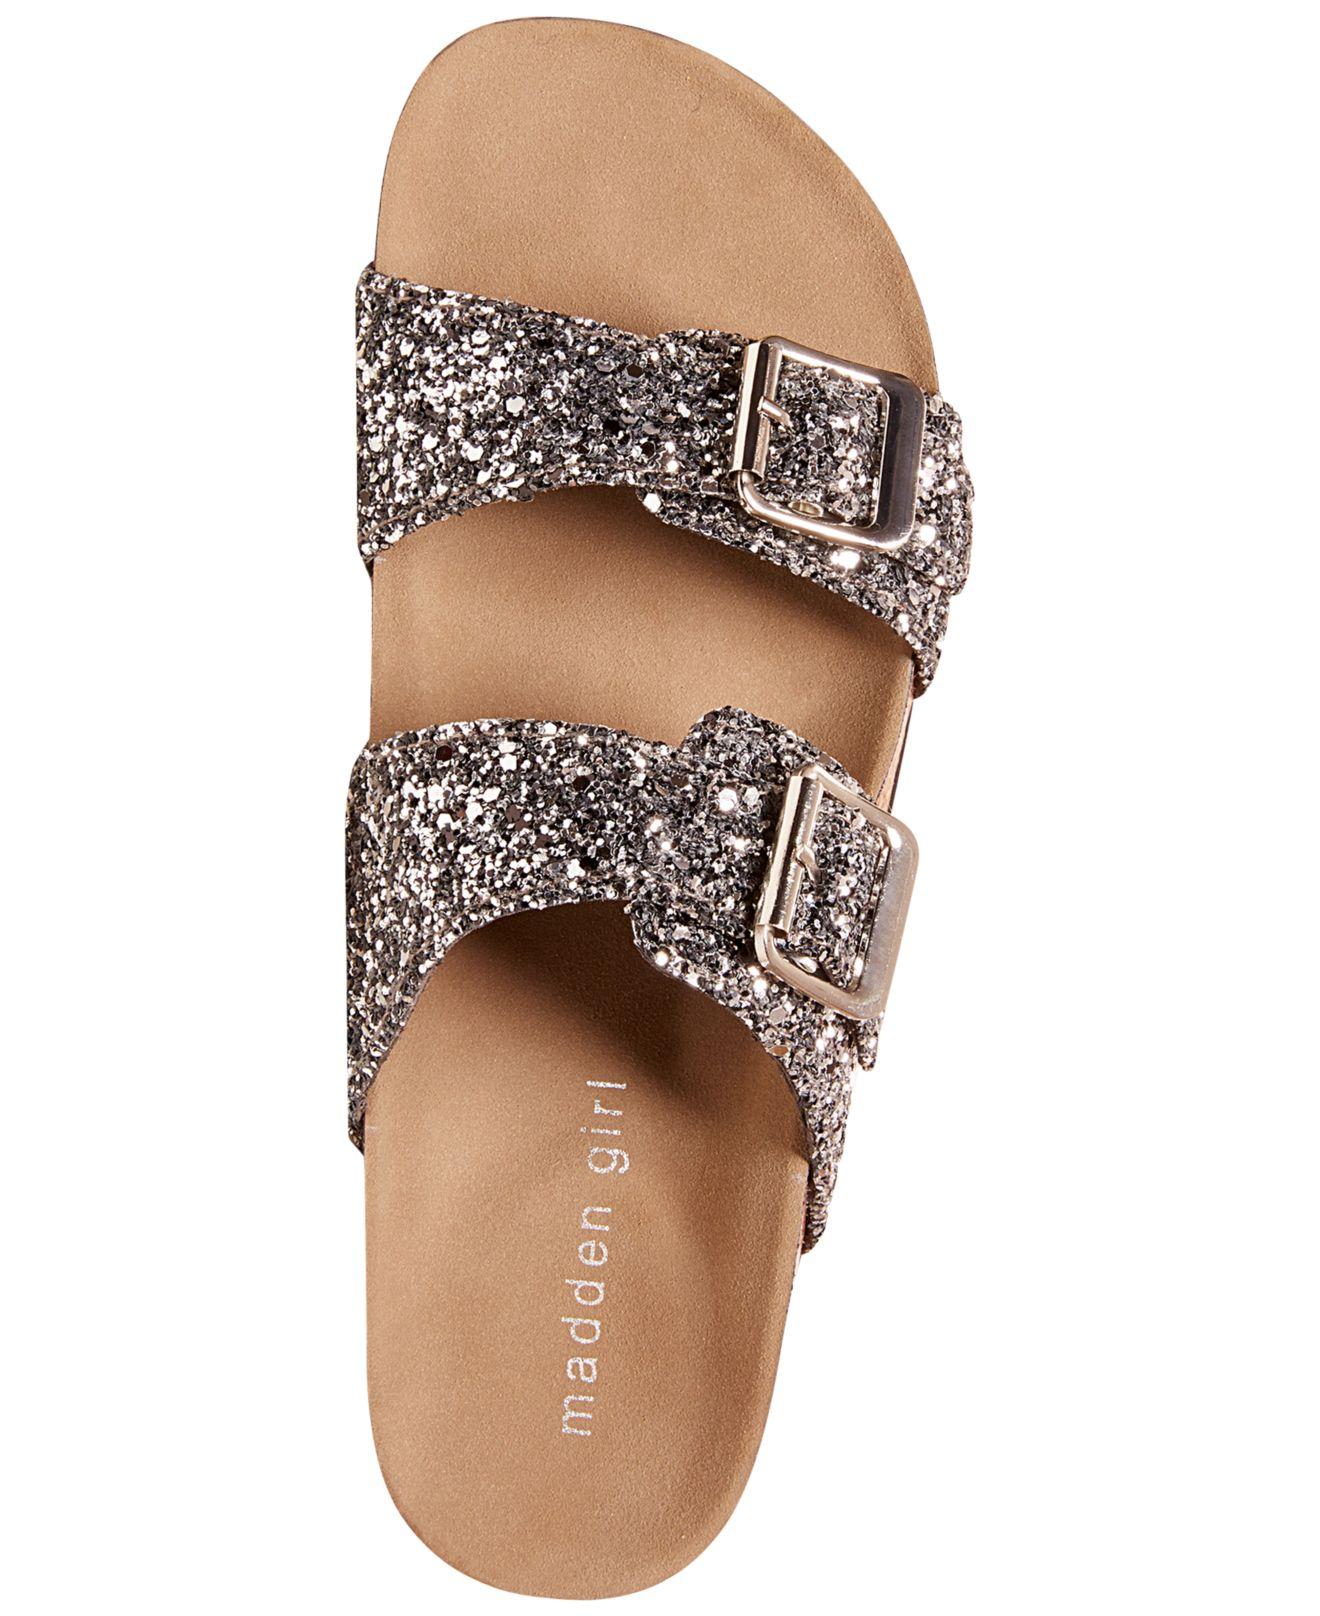 Lyst Madden Girl Brando Glitter Faux Leather Sandals In